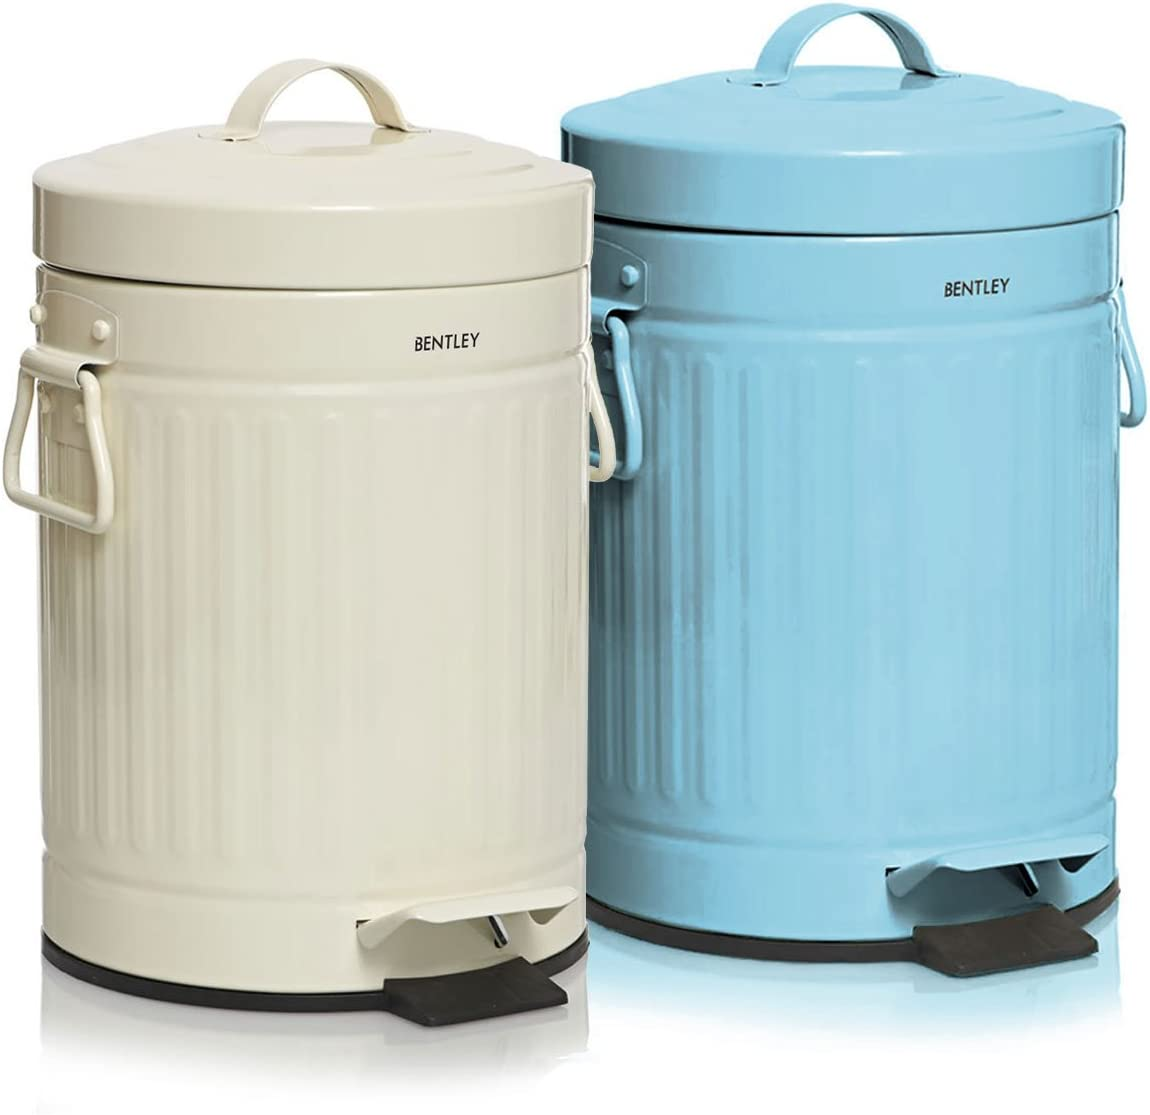 Charles Bentl 3L Cream Retro Steel Waste Rubbish Kitchen Bathroom Mini Pedal Bin